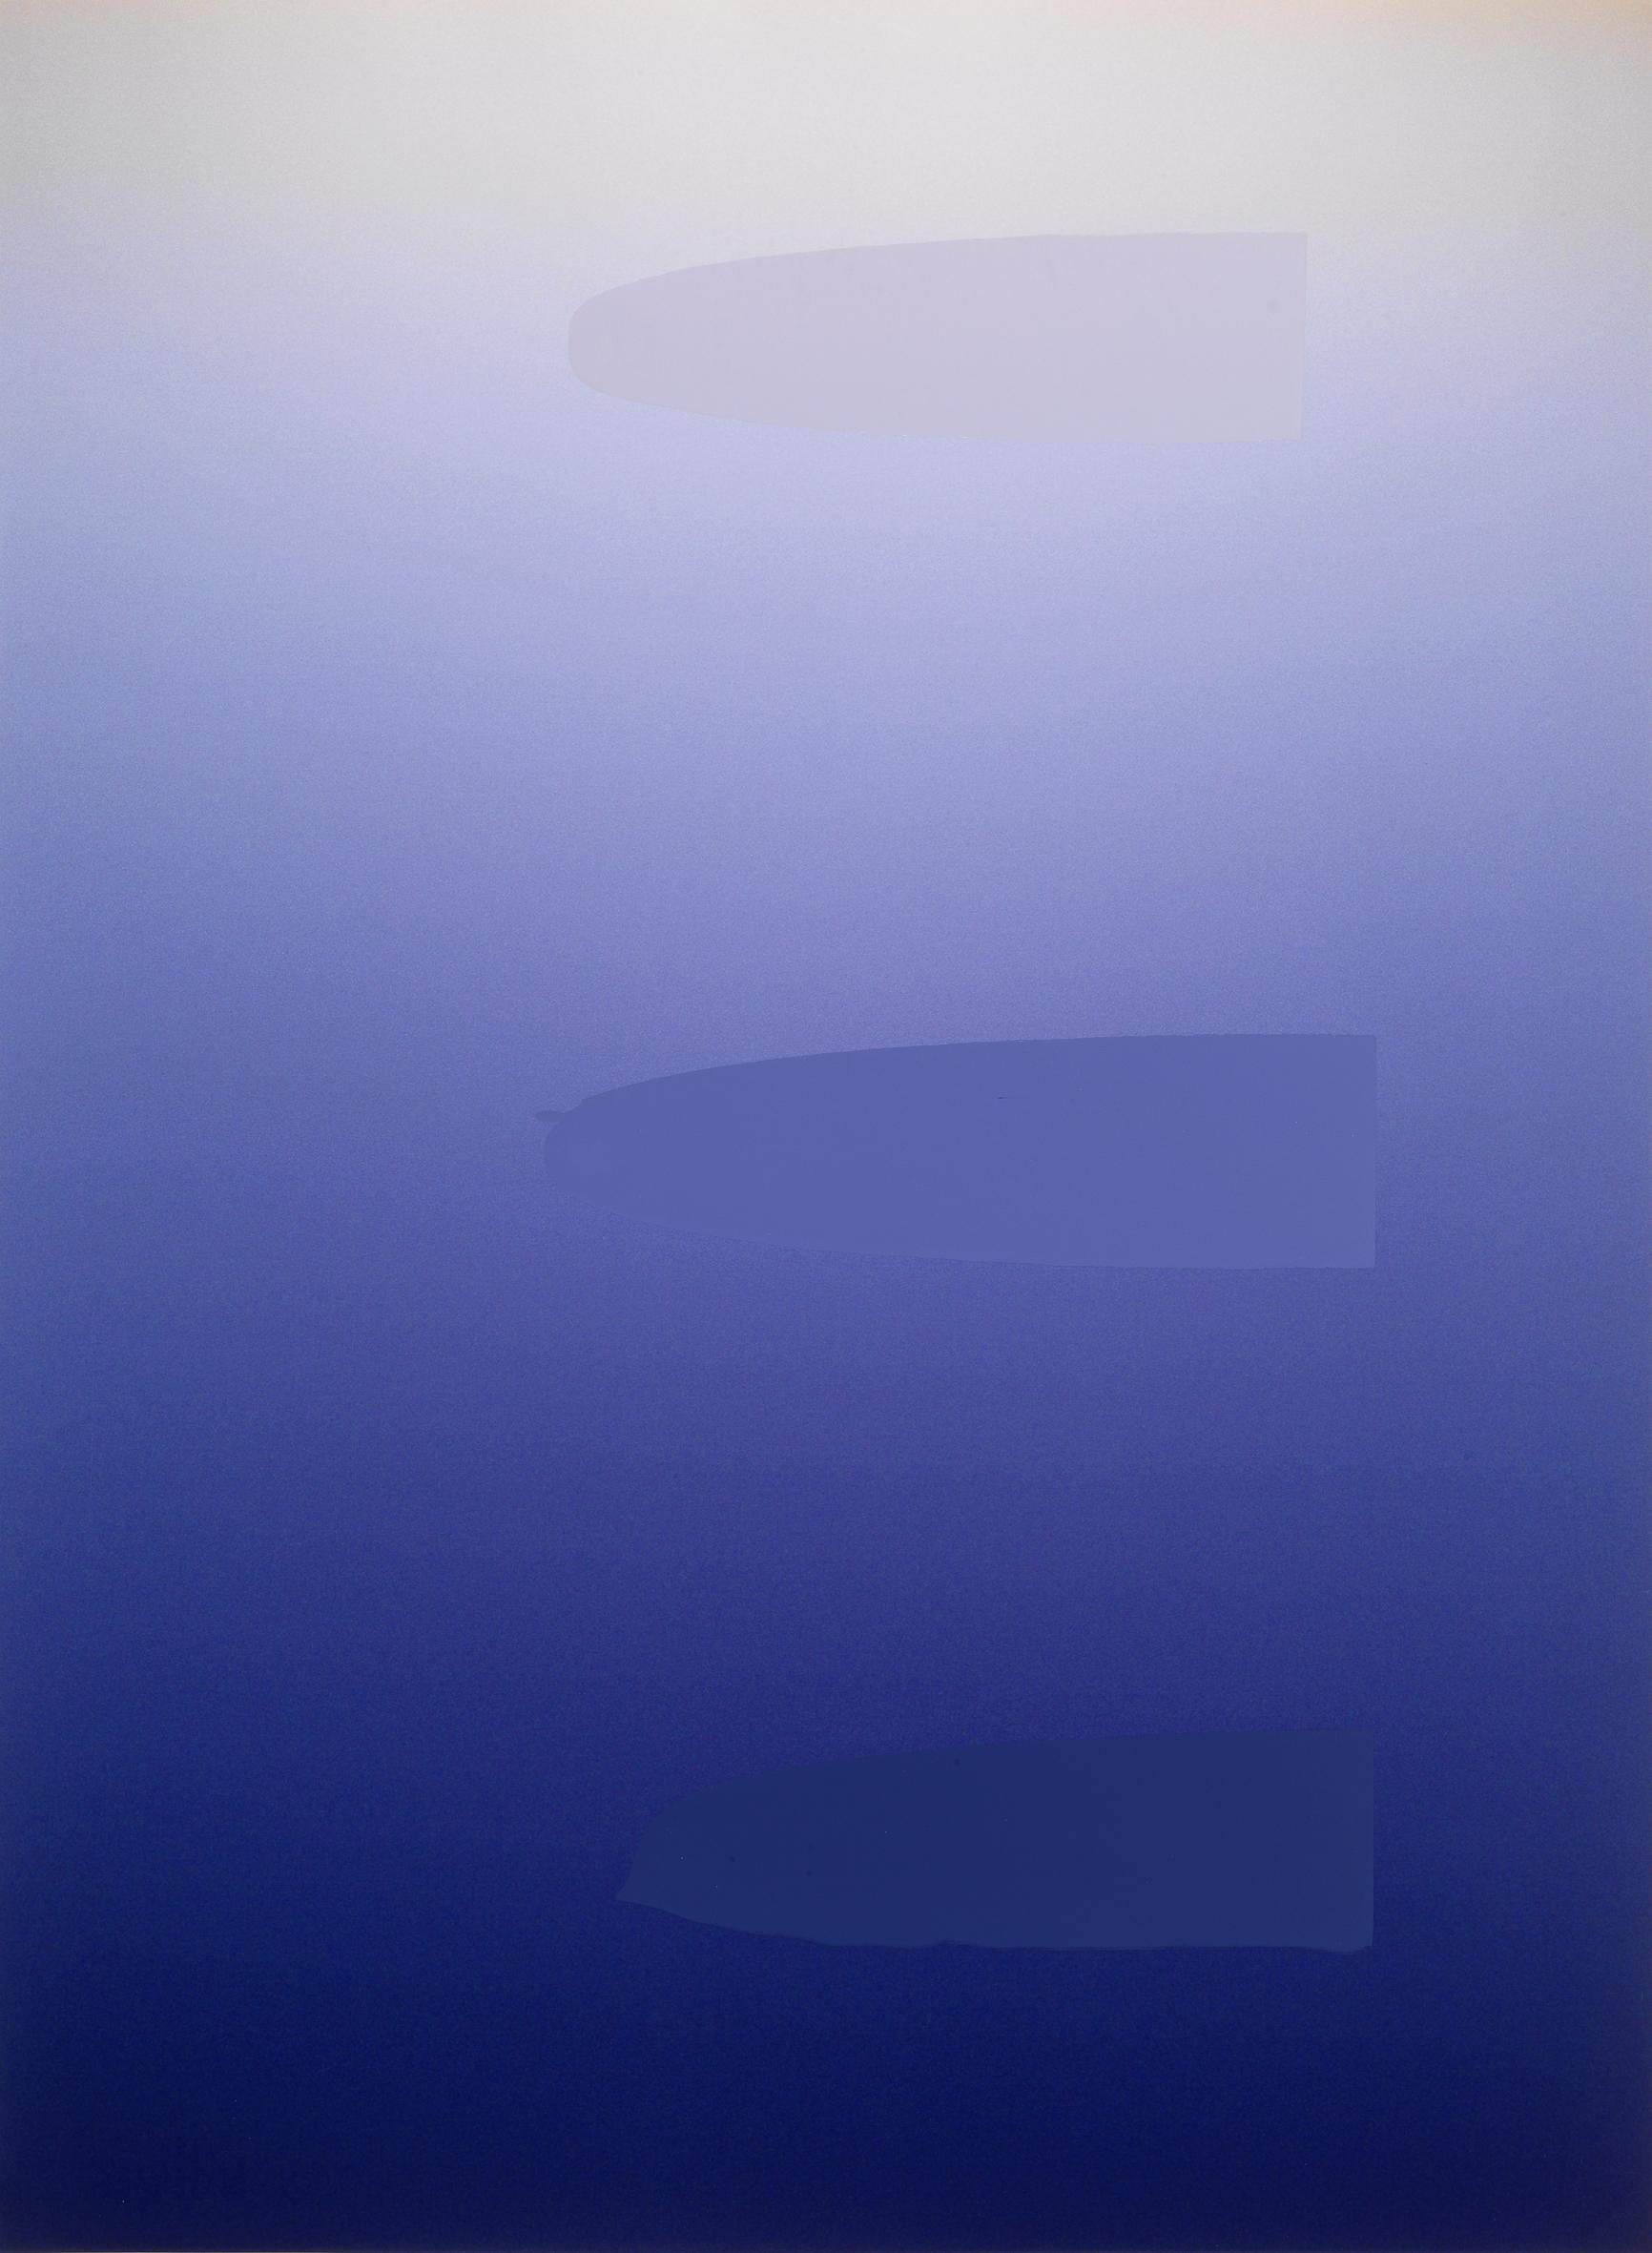 Untitled, 2011 |  | ProjecteSD